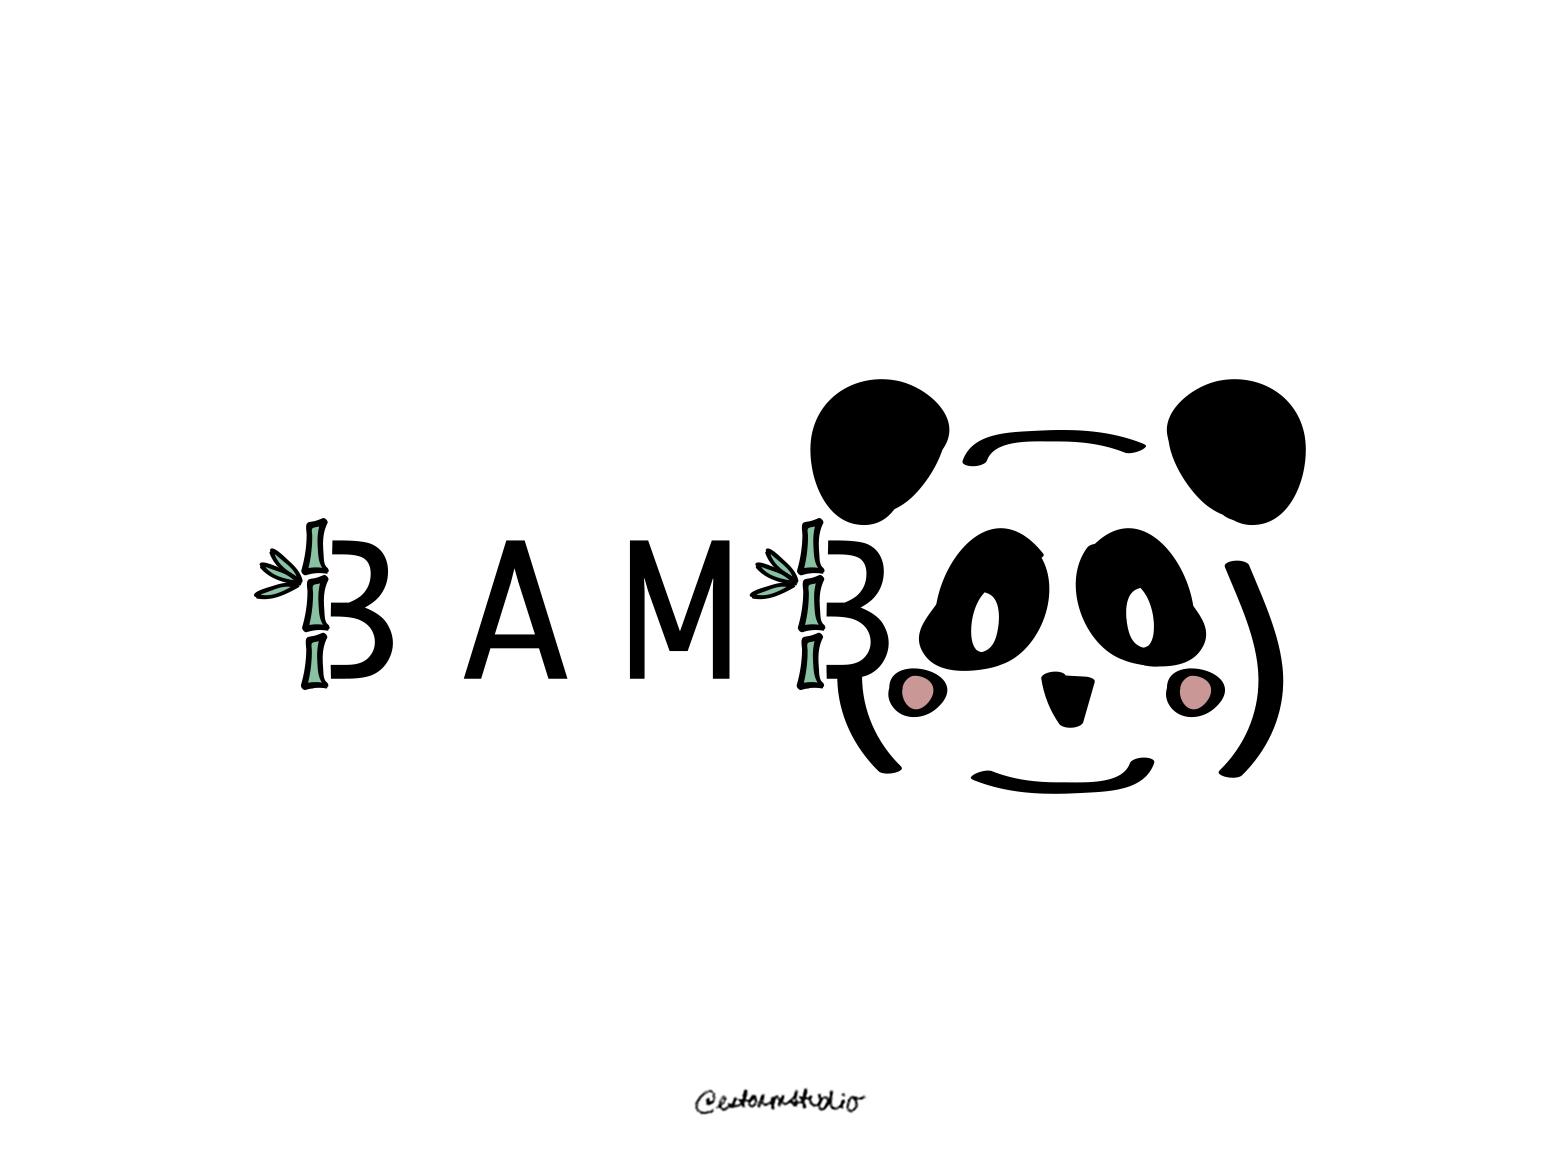 03 / Bamboo daily logo challenge vector logo campaign website advertising branding minimal icon illustration design